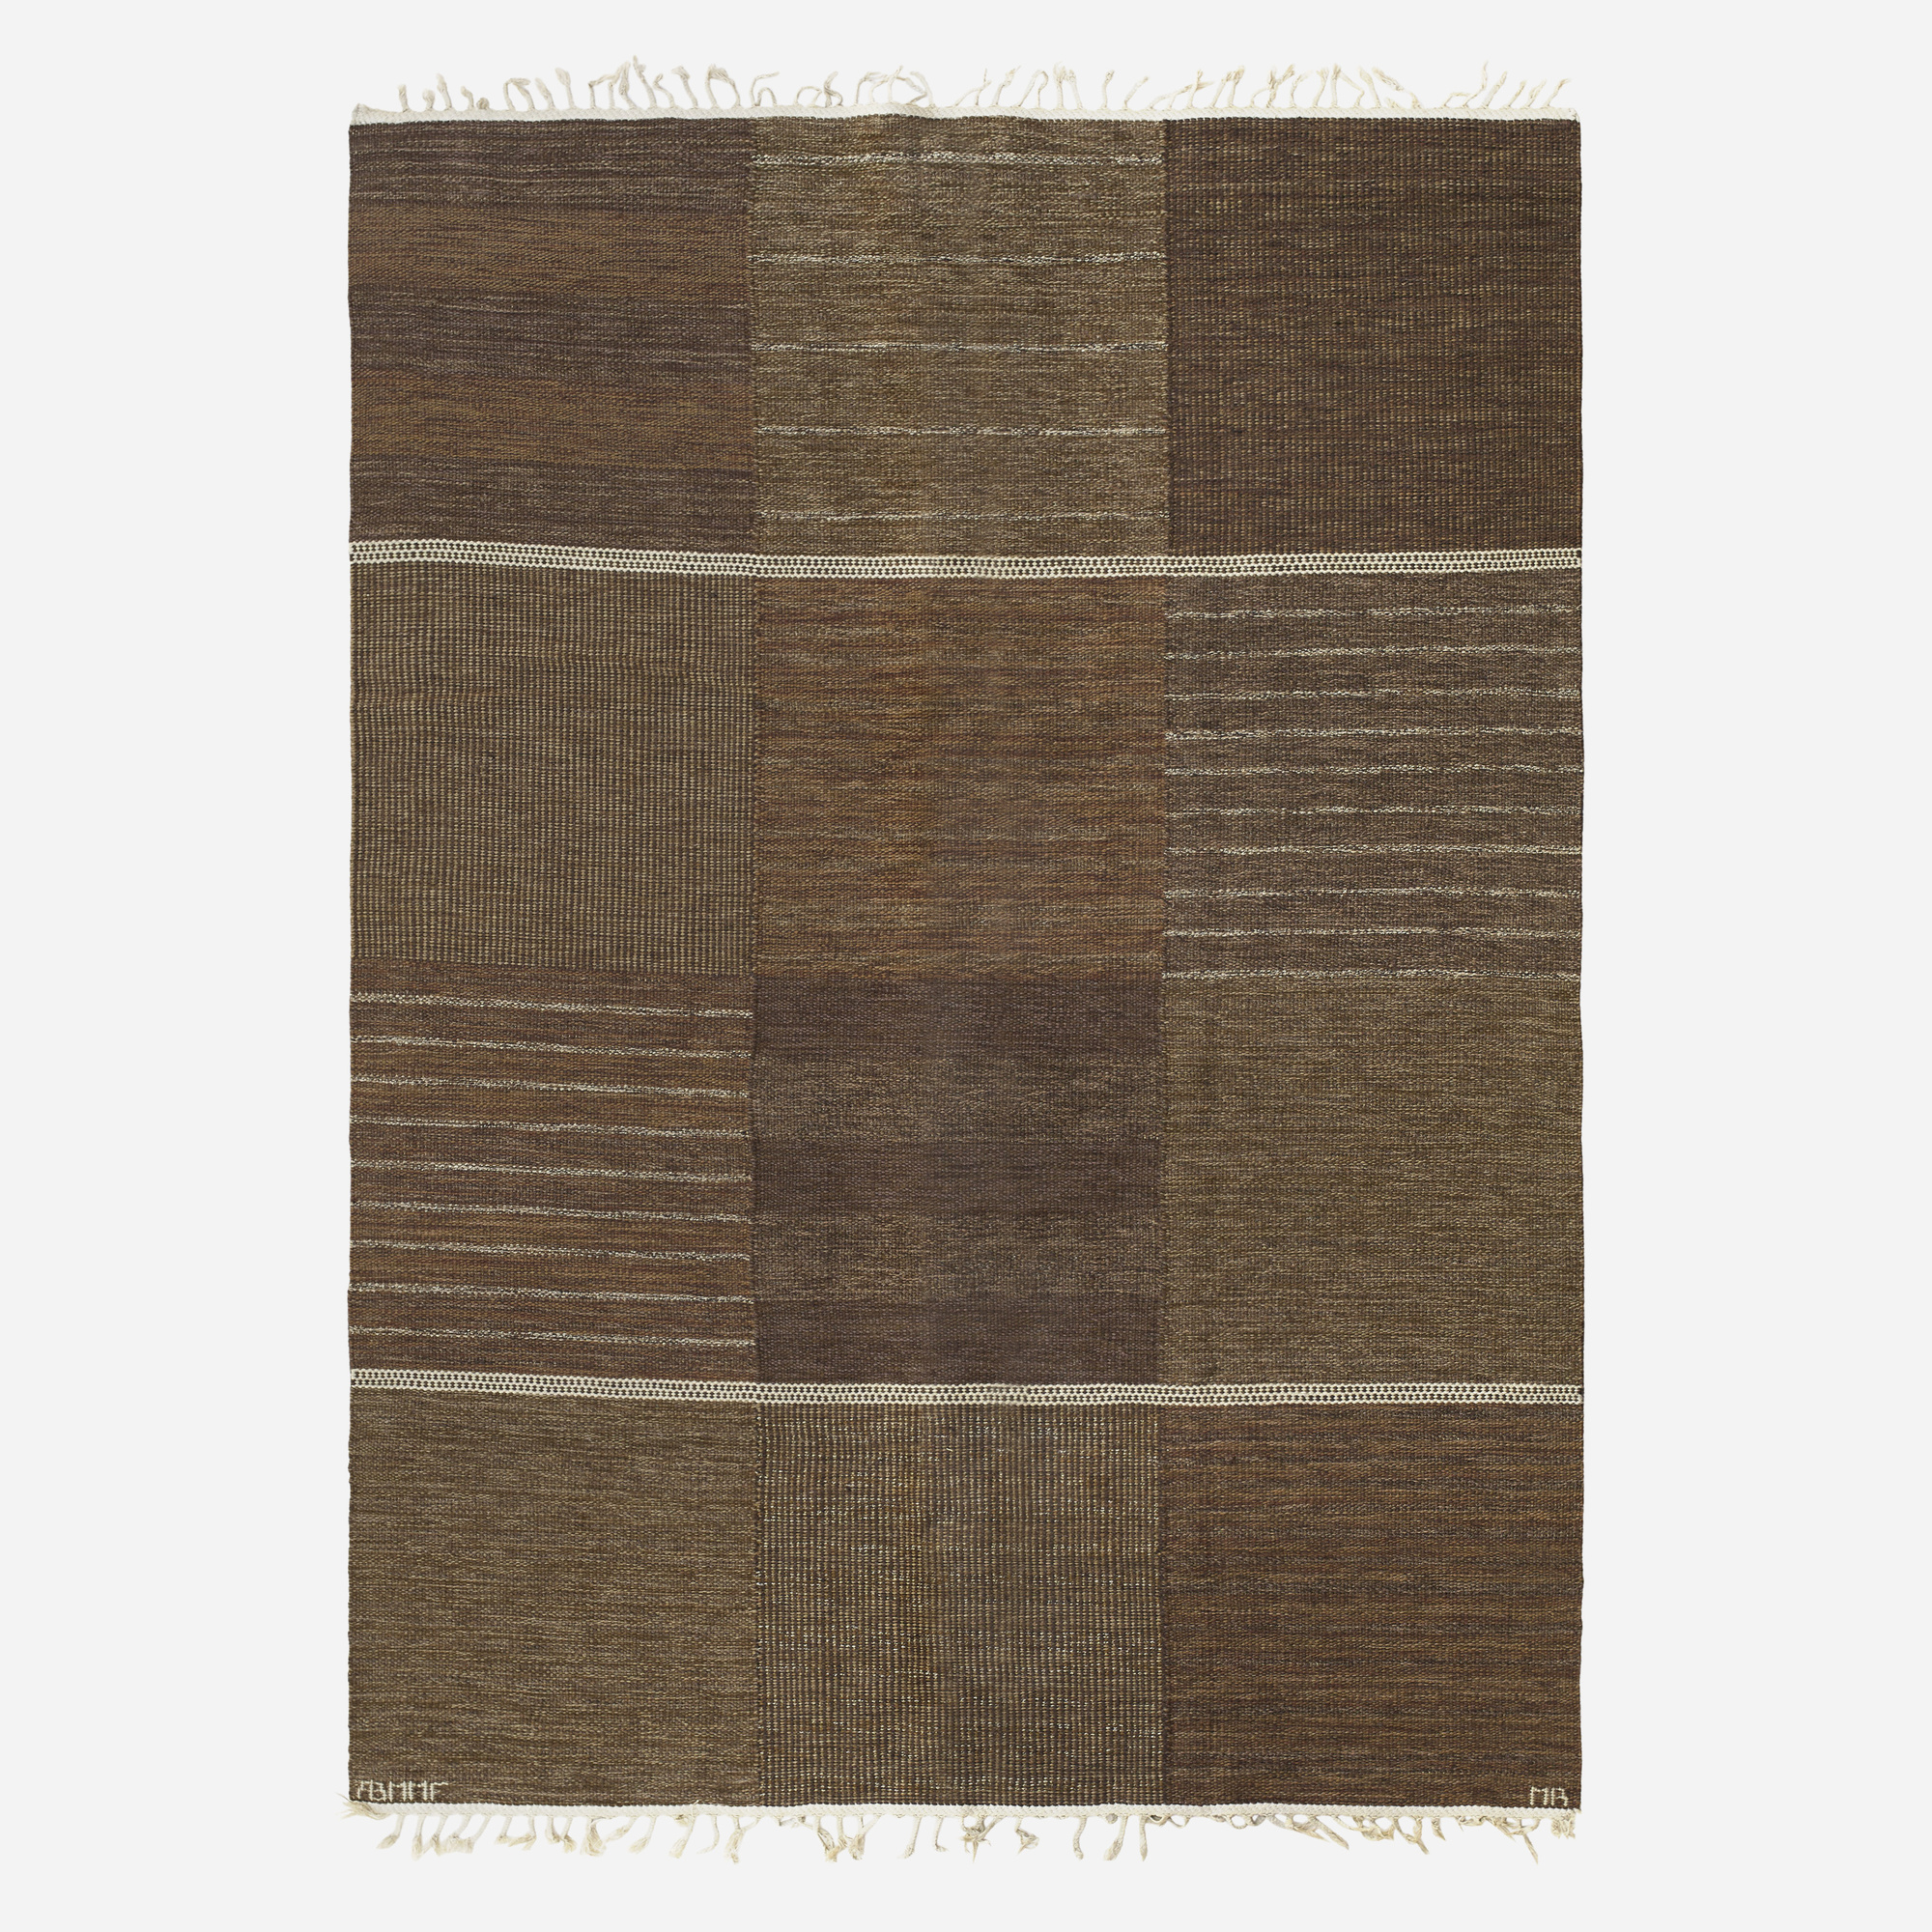 163: Marianne Richter / Tolv Rutor flatweave carpet (1 of 2)